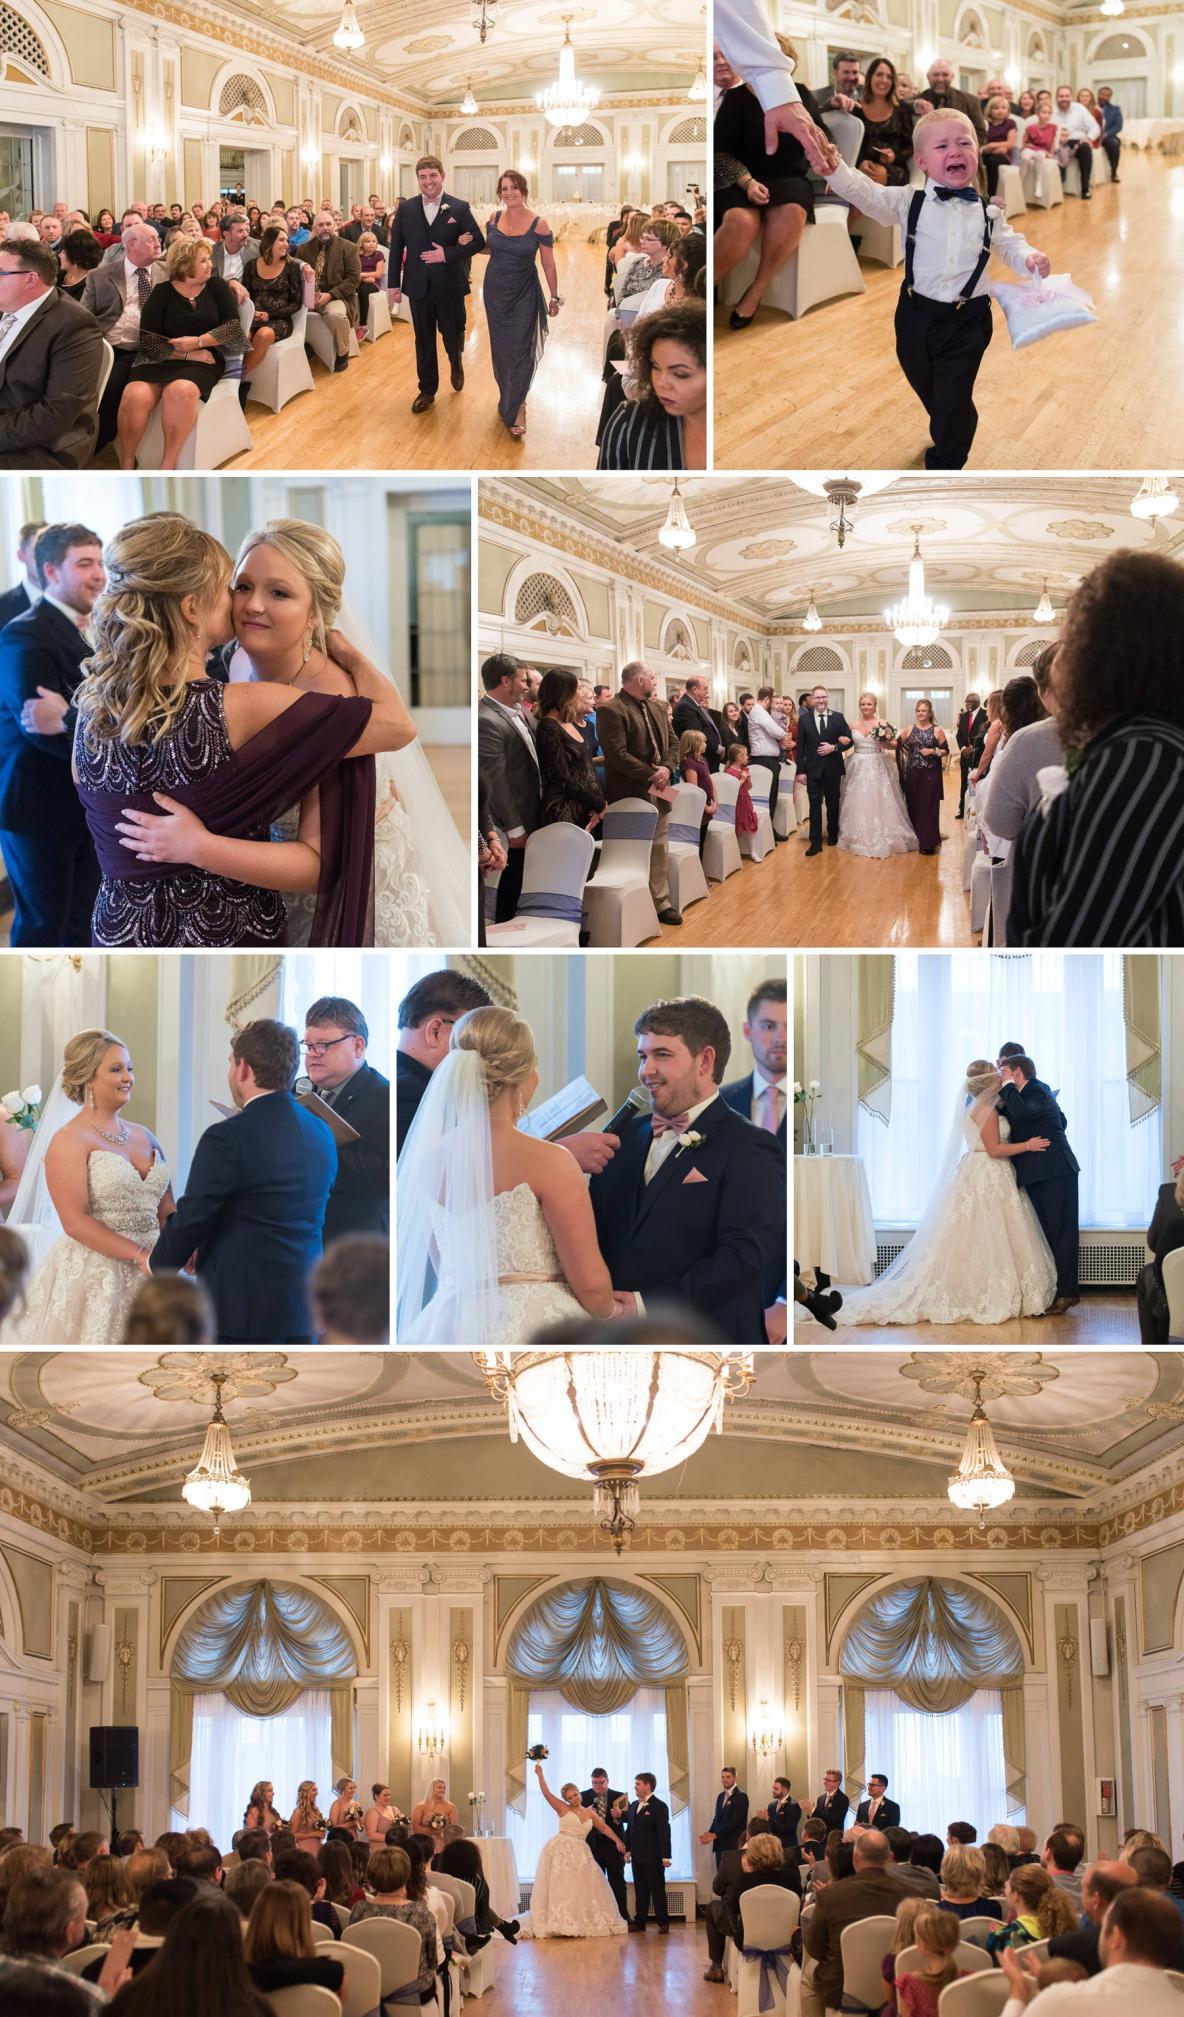 The wedding ceremony at Greysolon.